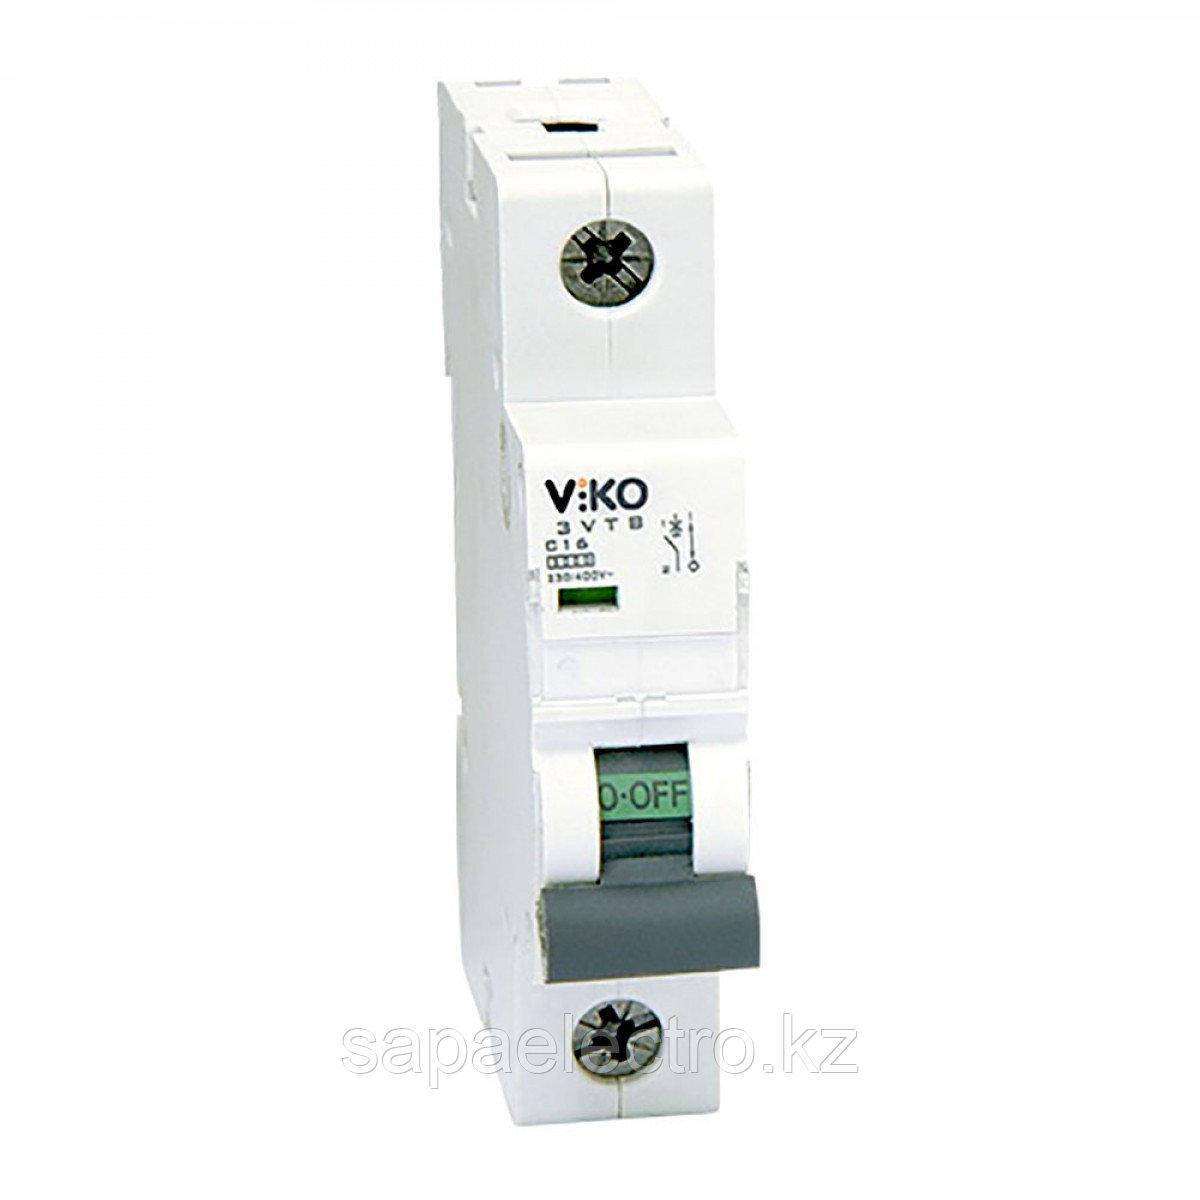 3VTB-1B50  Автомат 1P 50A  3KA  B-C  (VIKO) 120шт